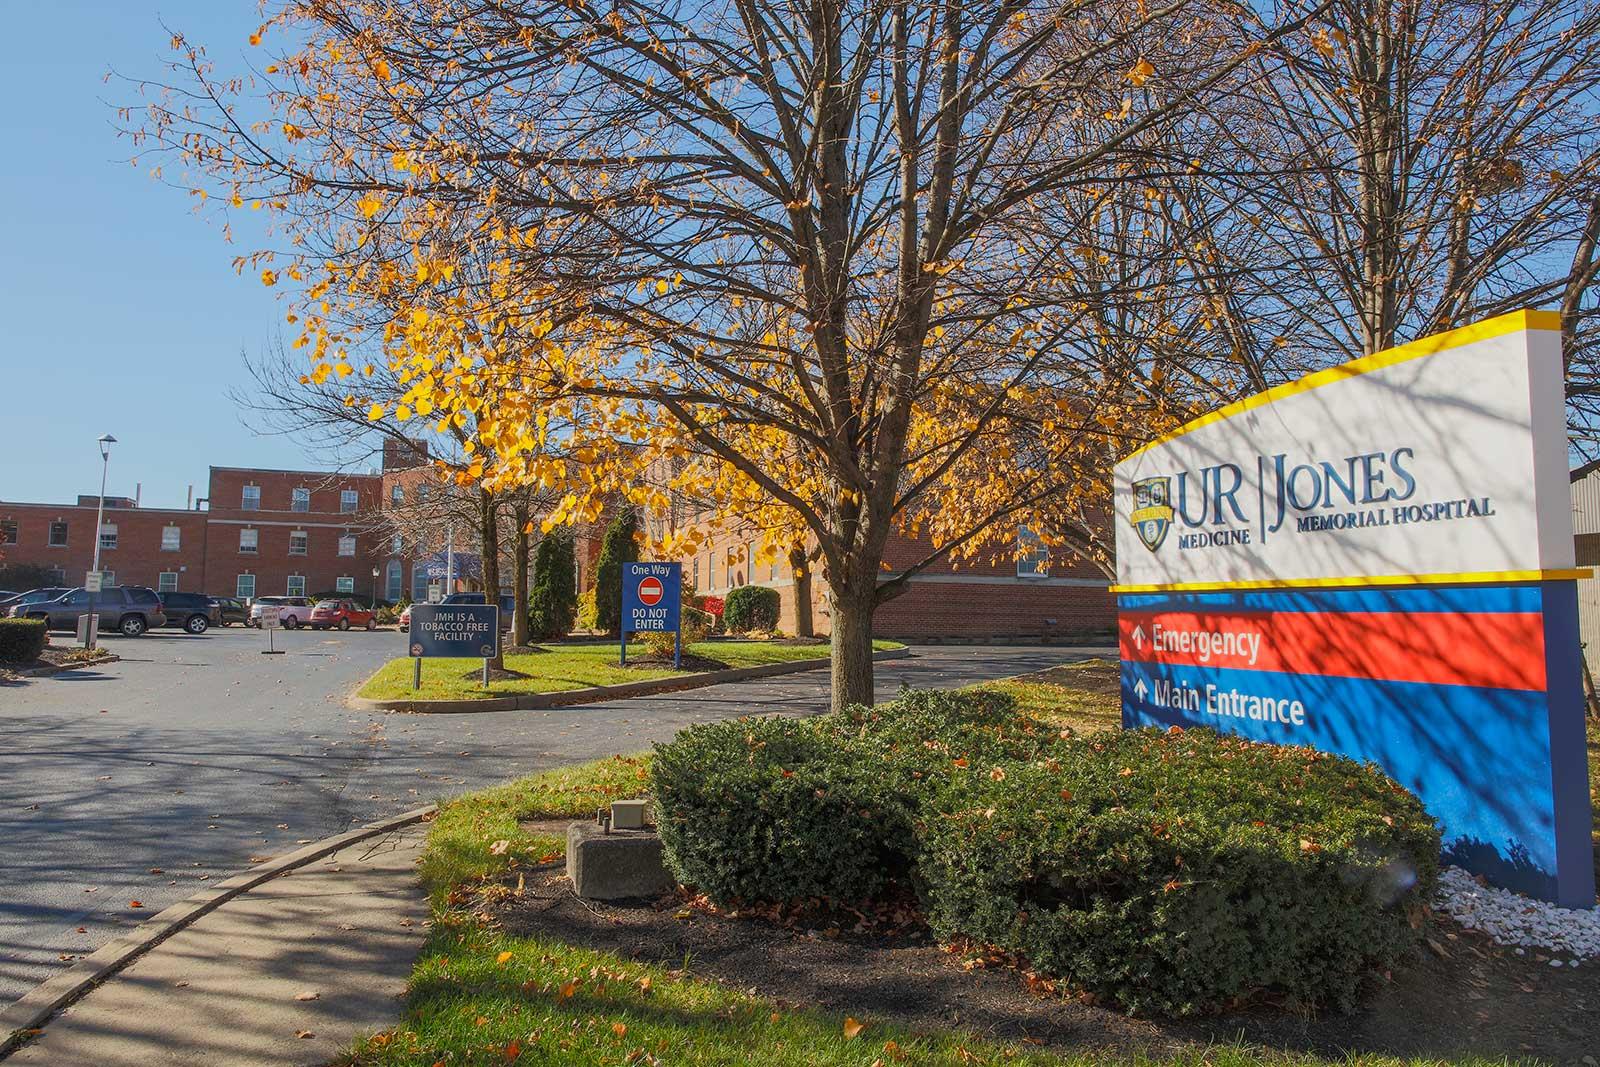 Jones Memorial Hospital